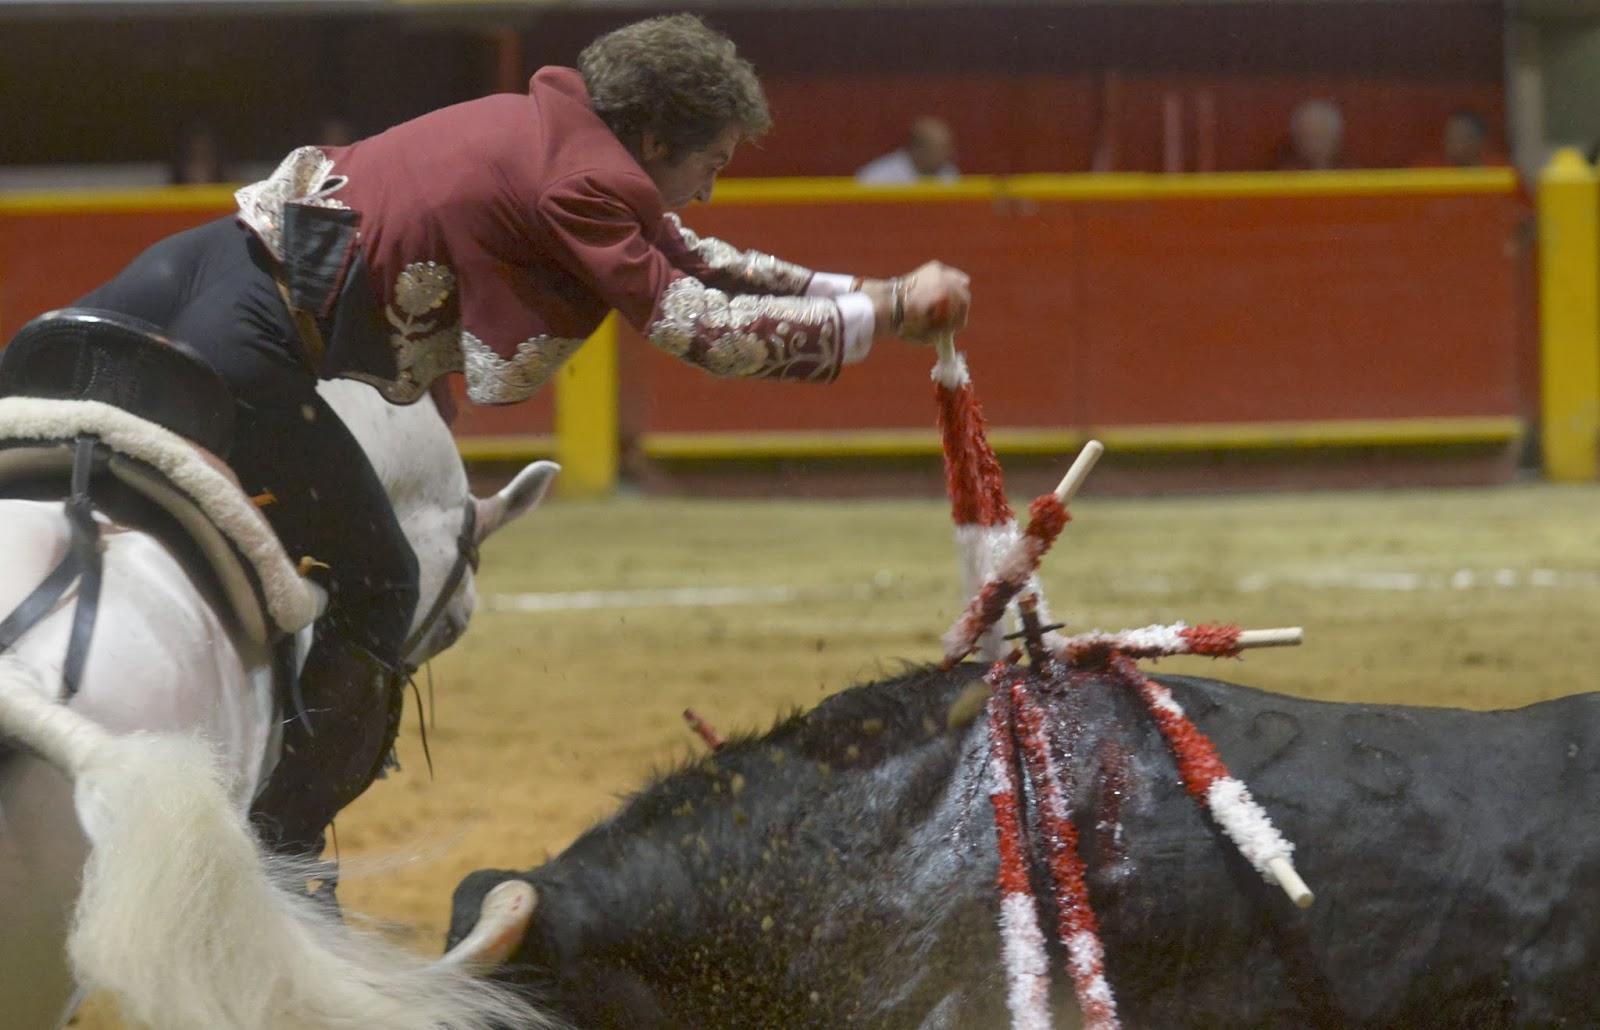 Spanish, Mounted, Spain, Bullfighting, Pablo Hermoso de Mendoza, Celebrate, Cut, Ears, La Macarena, Bullring, Medellin, Antioquia, Deparment, Colombia, Sports, Perform, Bull,